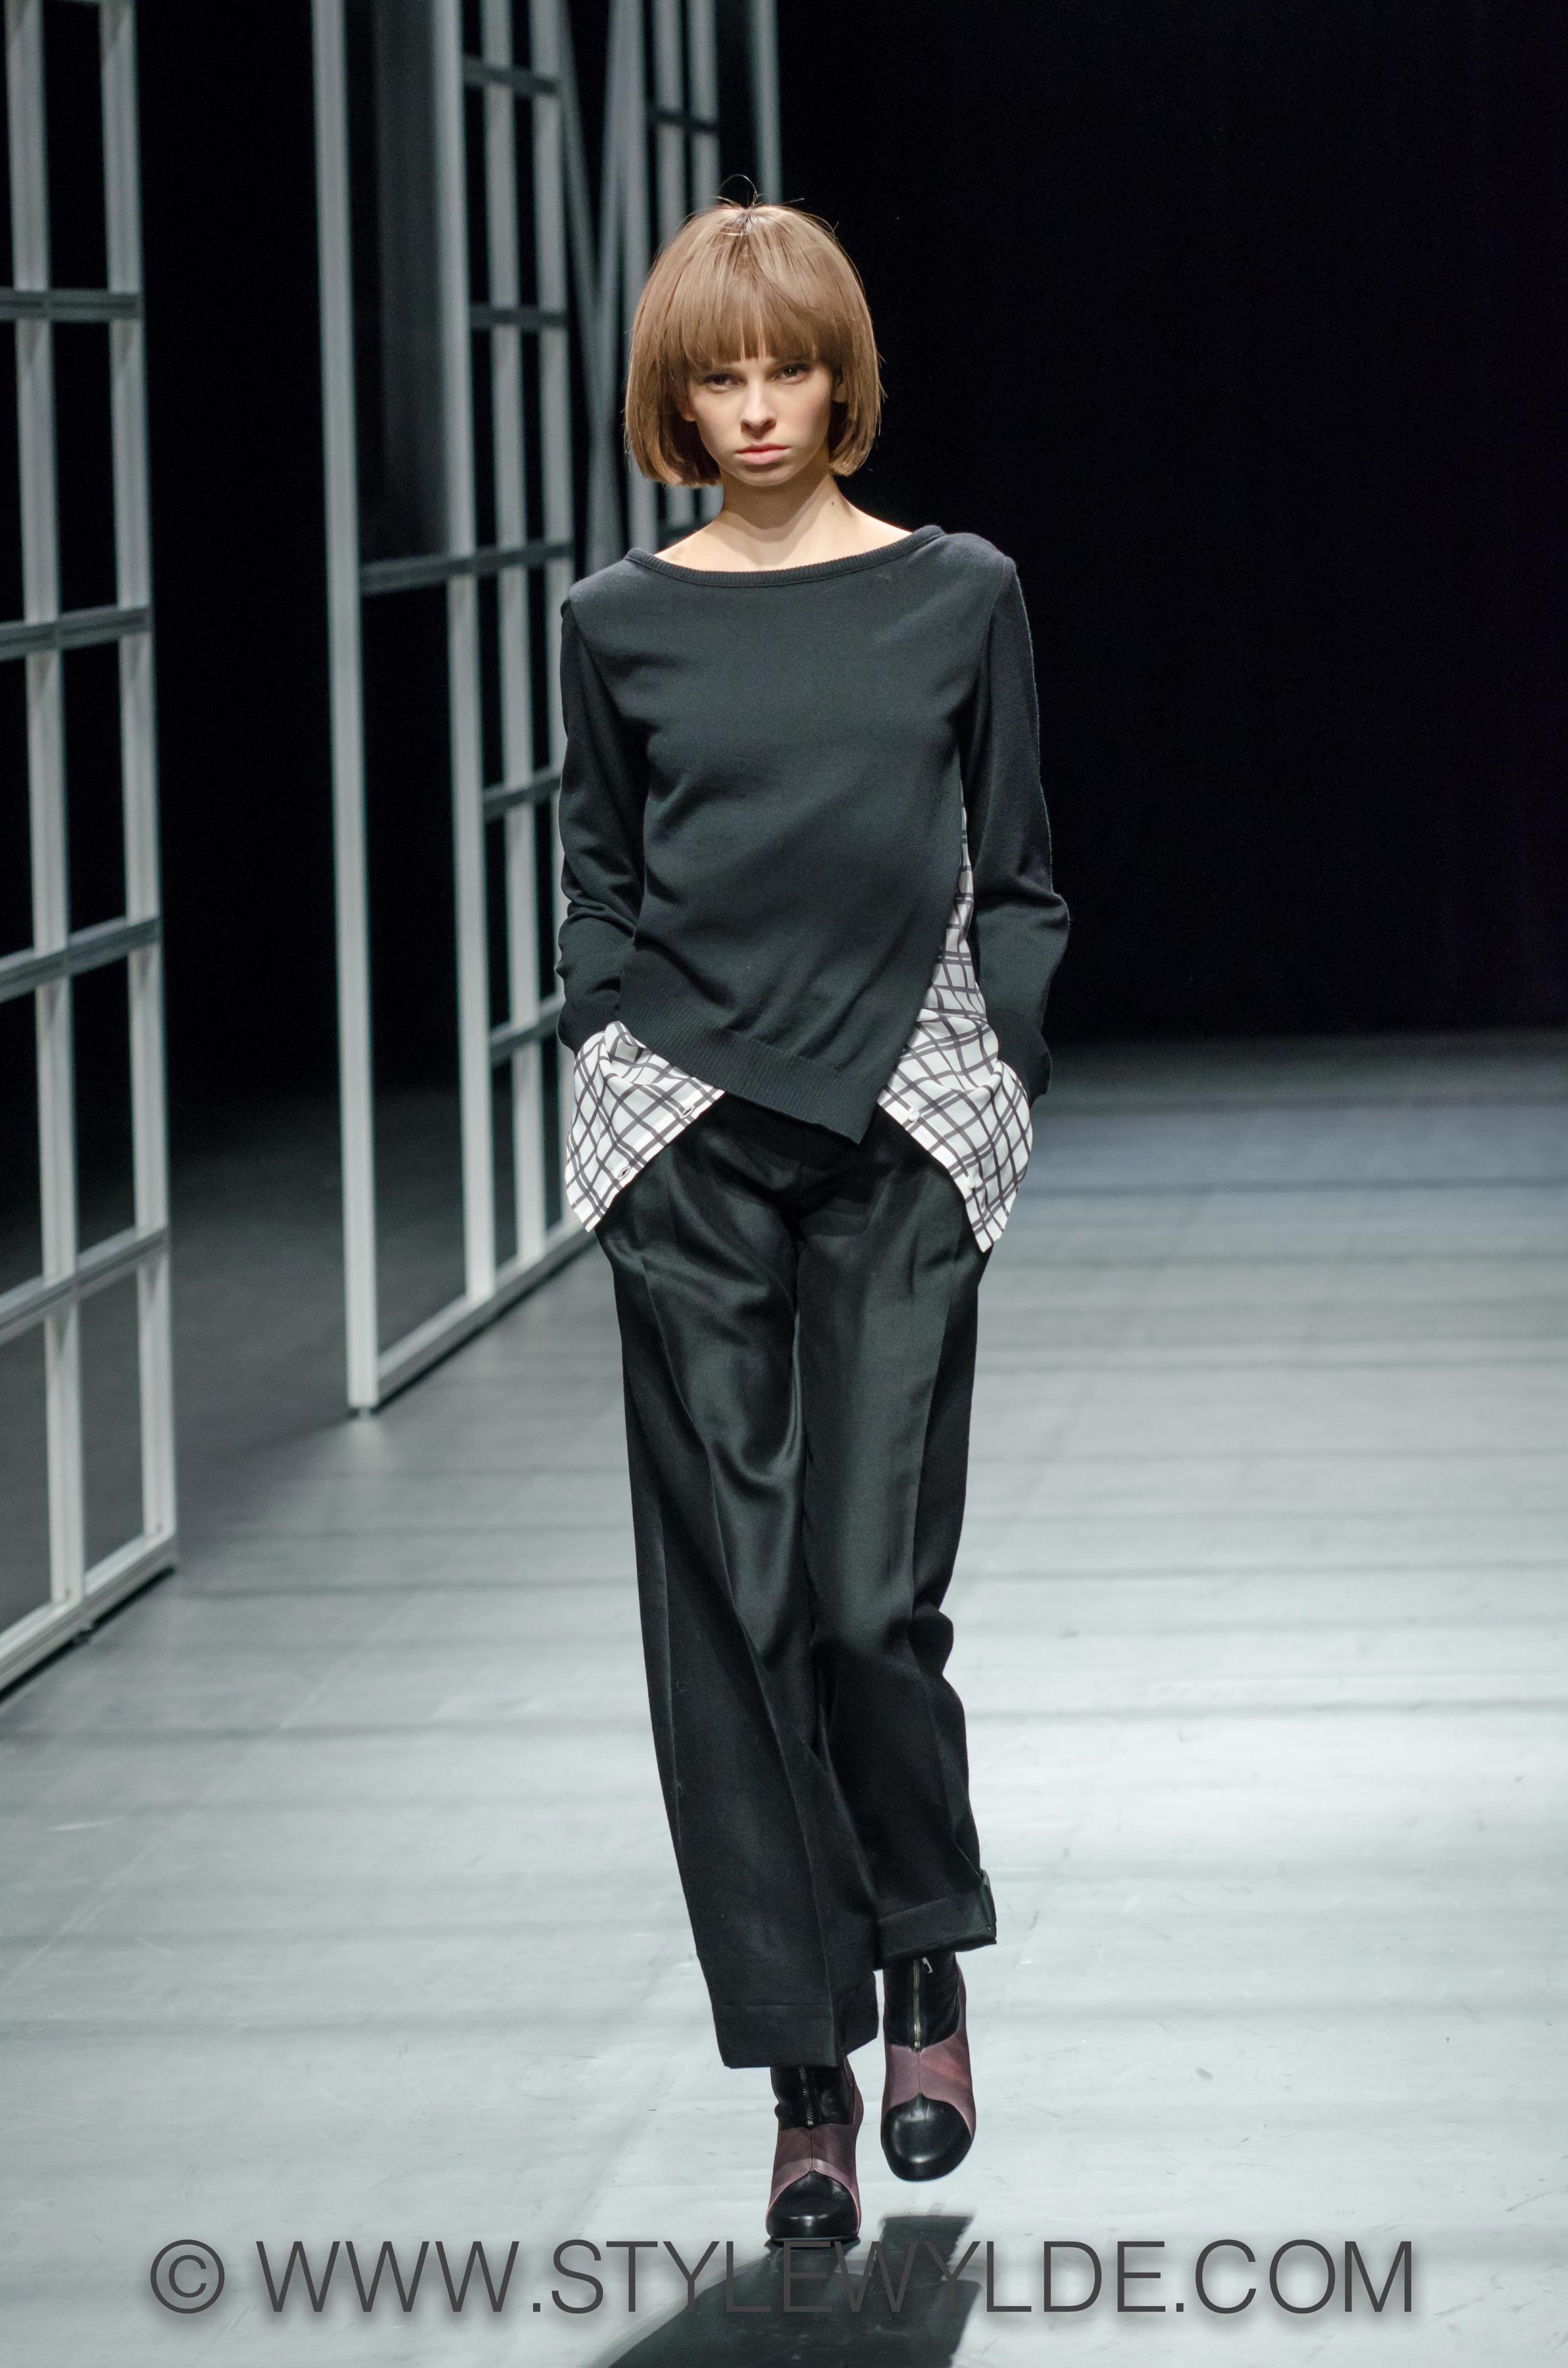 StyleWylde_YasutoshiEzumi_AW14_story (1 of 1)-23.jpg